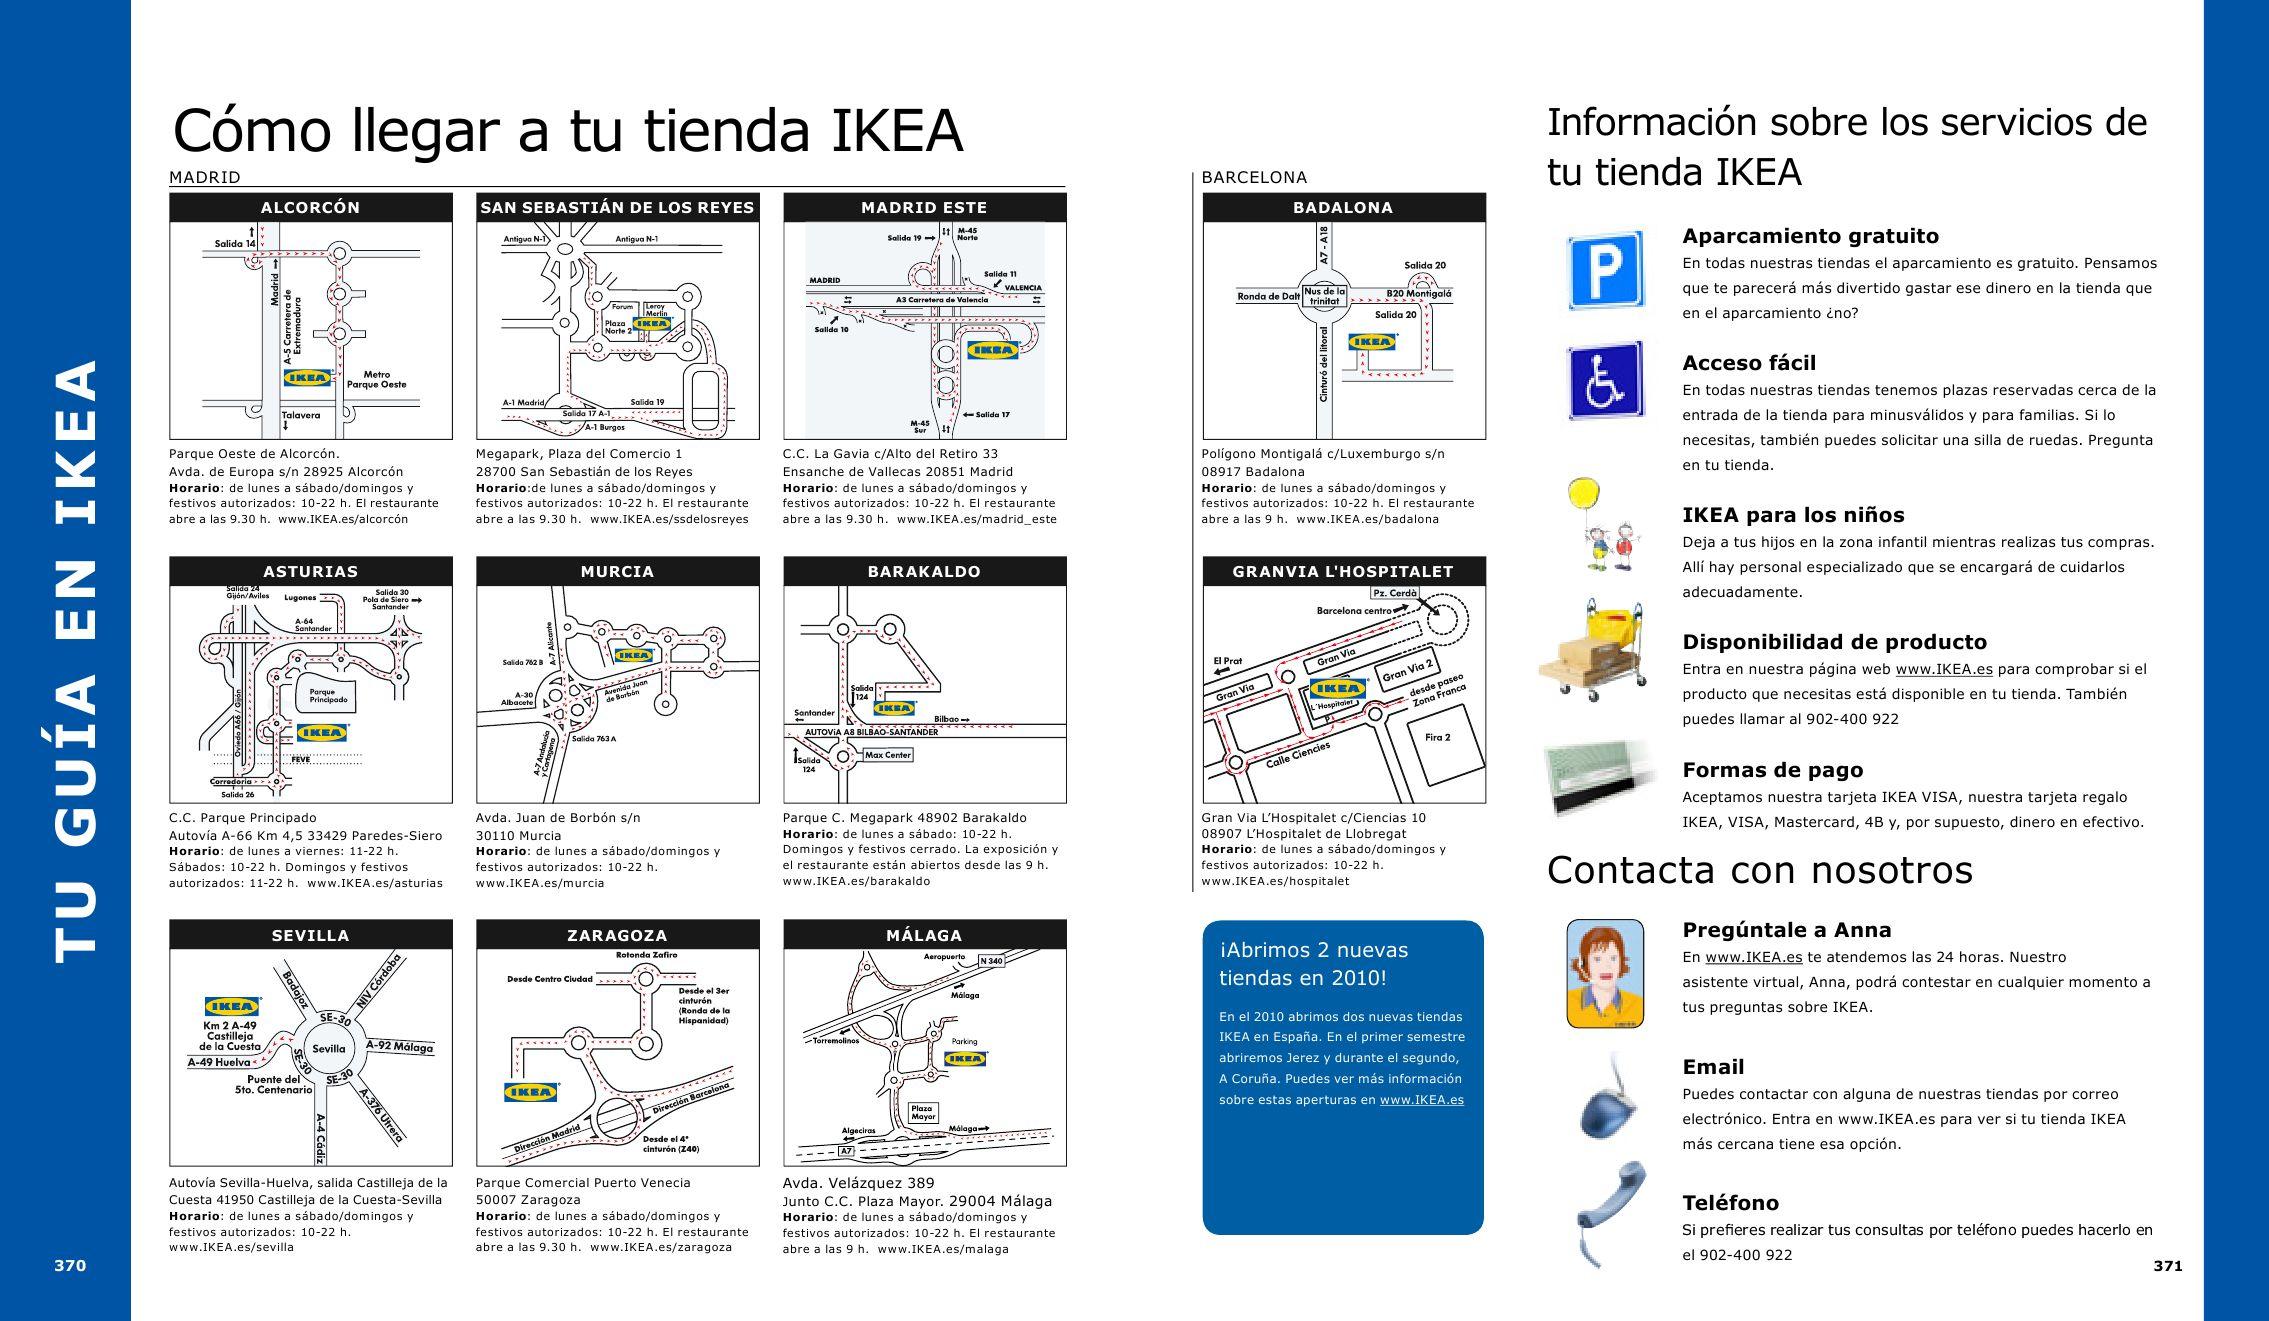 Cat logo ikea 2010 by miguelator issuu for Ikea horario festivos